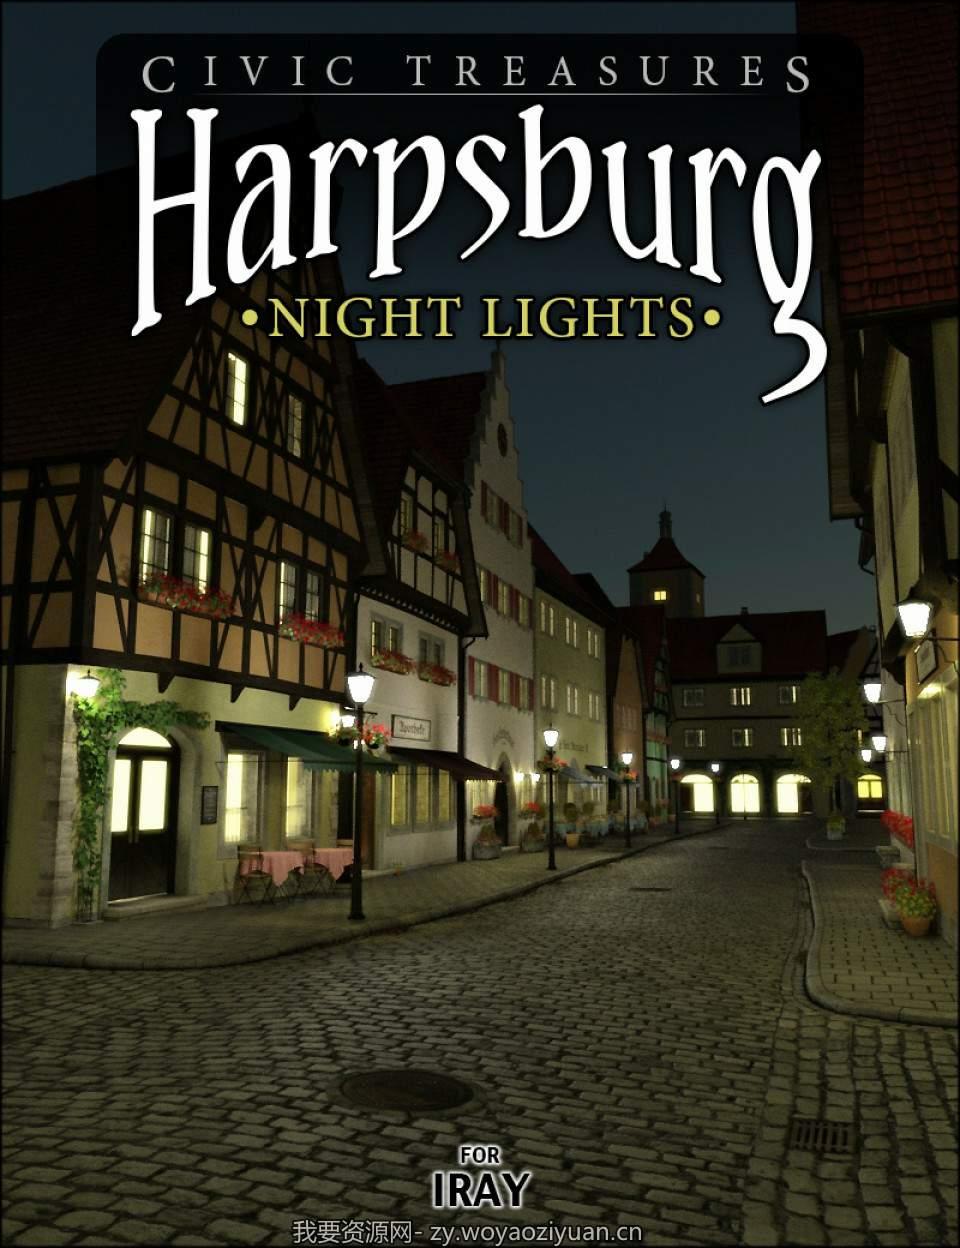 Harpsburg Night Lights for Iray